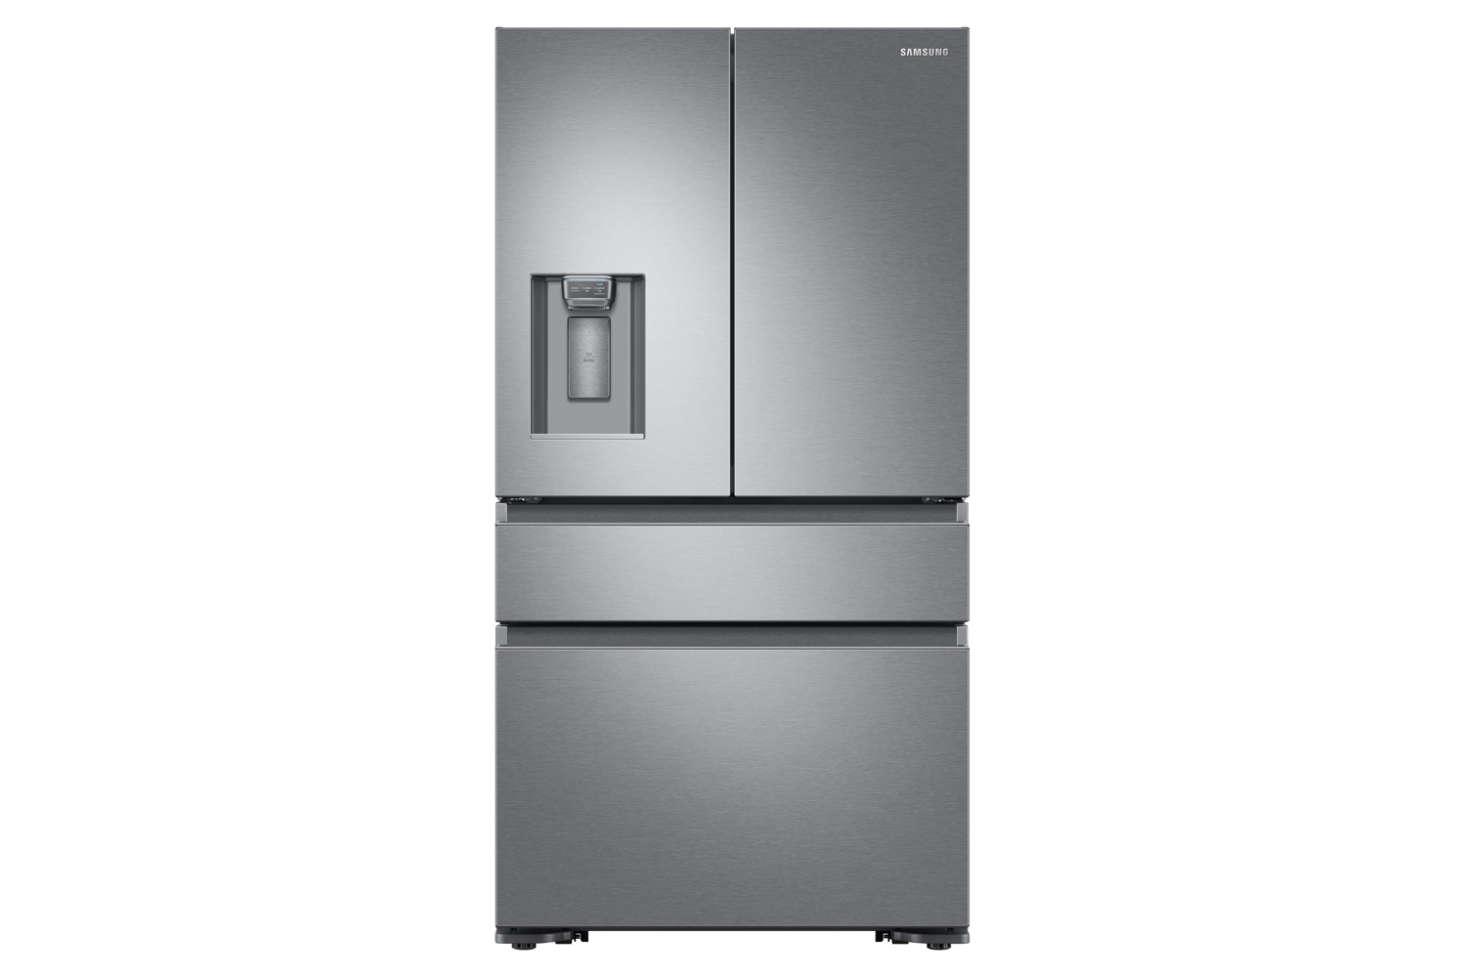 10 Easy Pieces Best 36 Inch Counter Depth Refrigerators